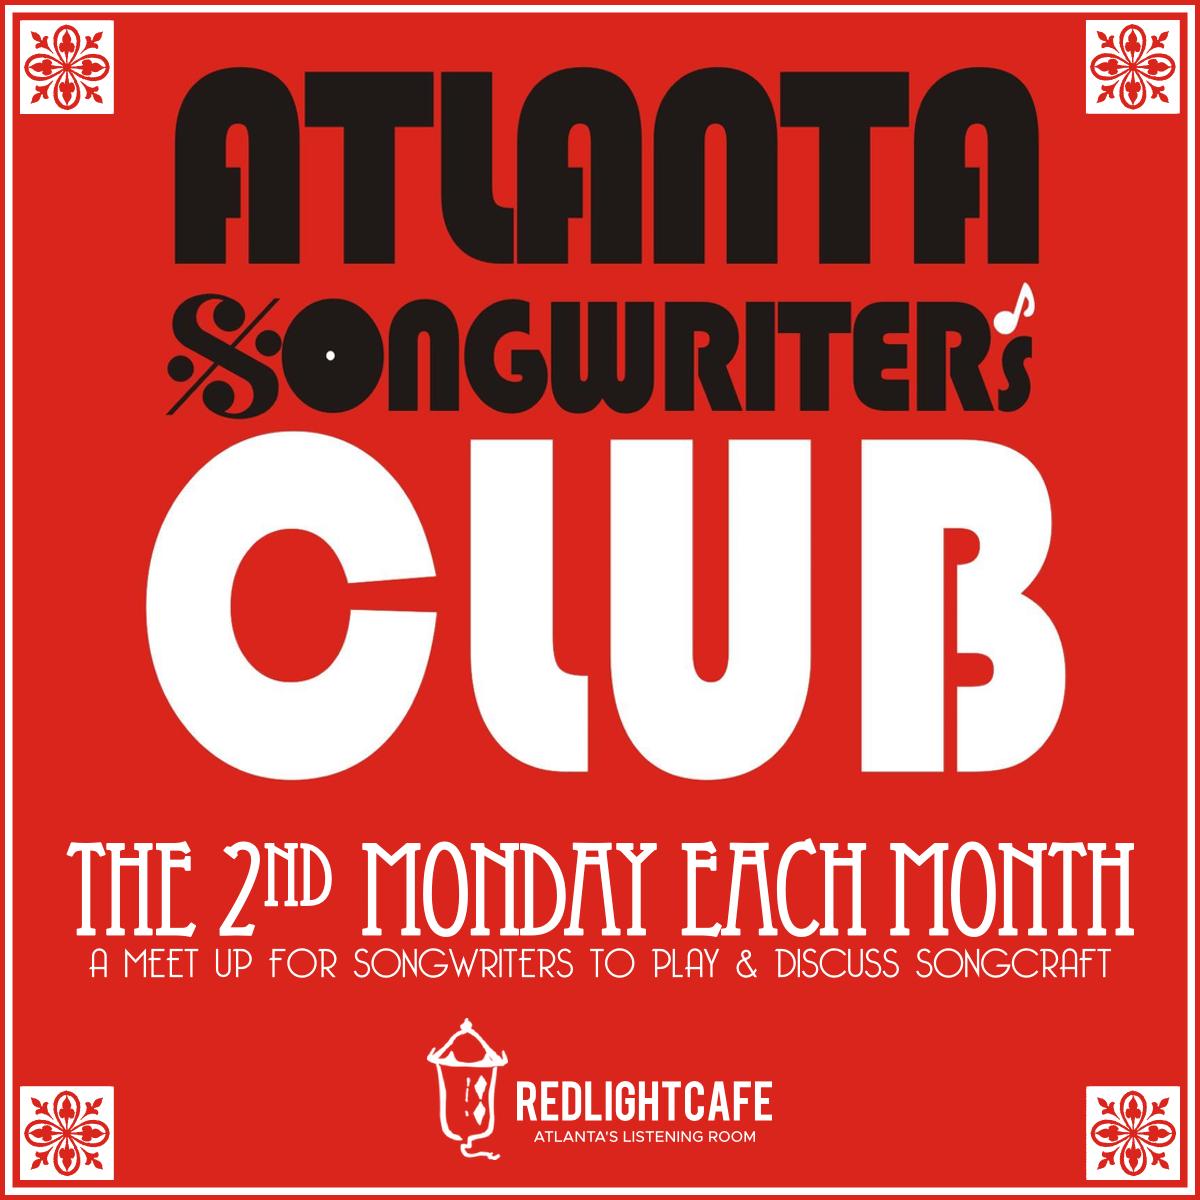 Atlanta Songwriters Club Meet Up — August 12, 2019 — Red Light Café, Atlanta, GA